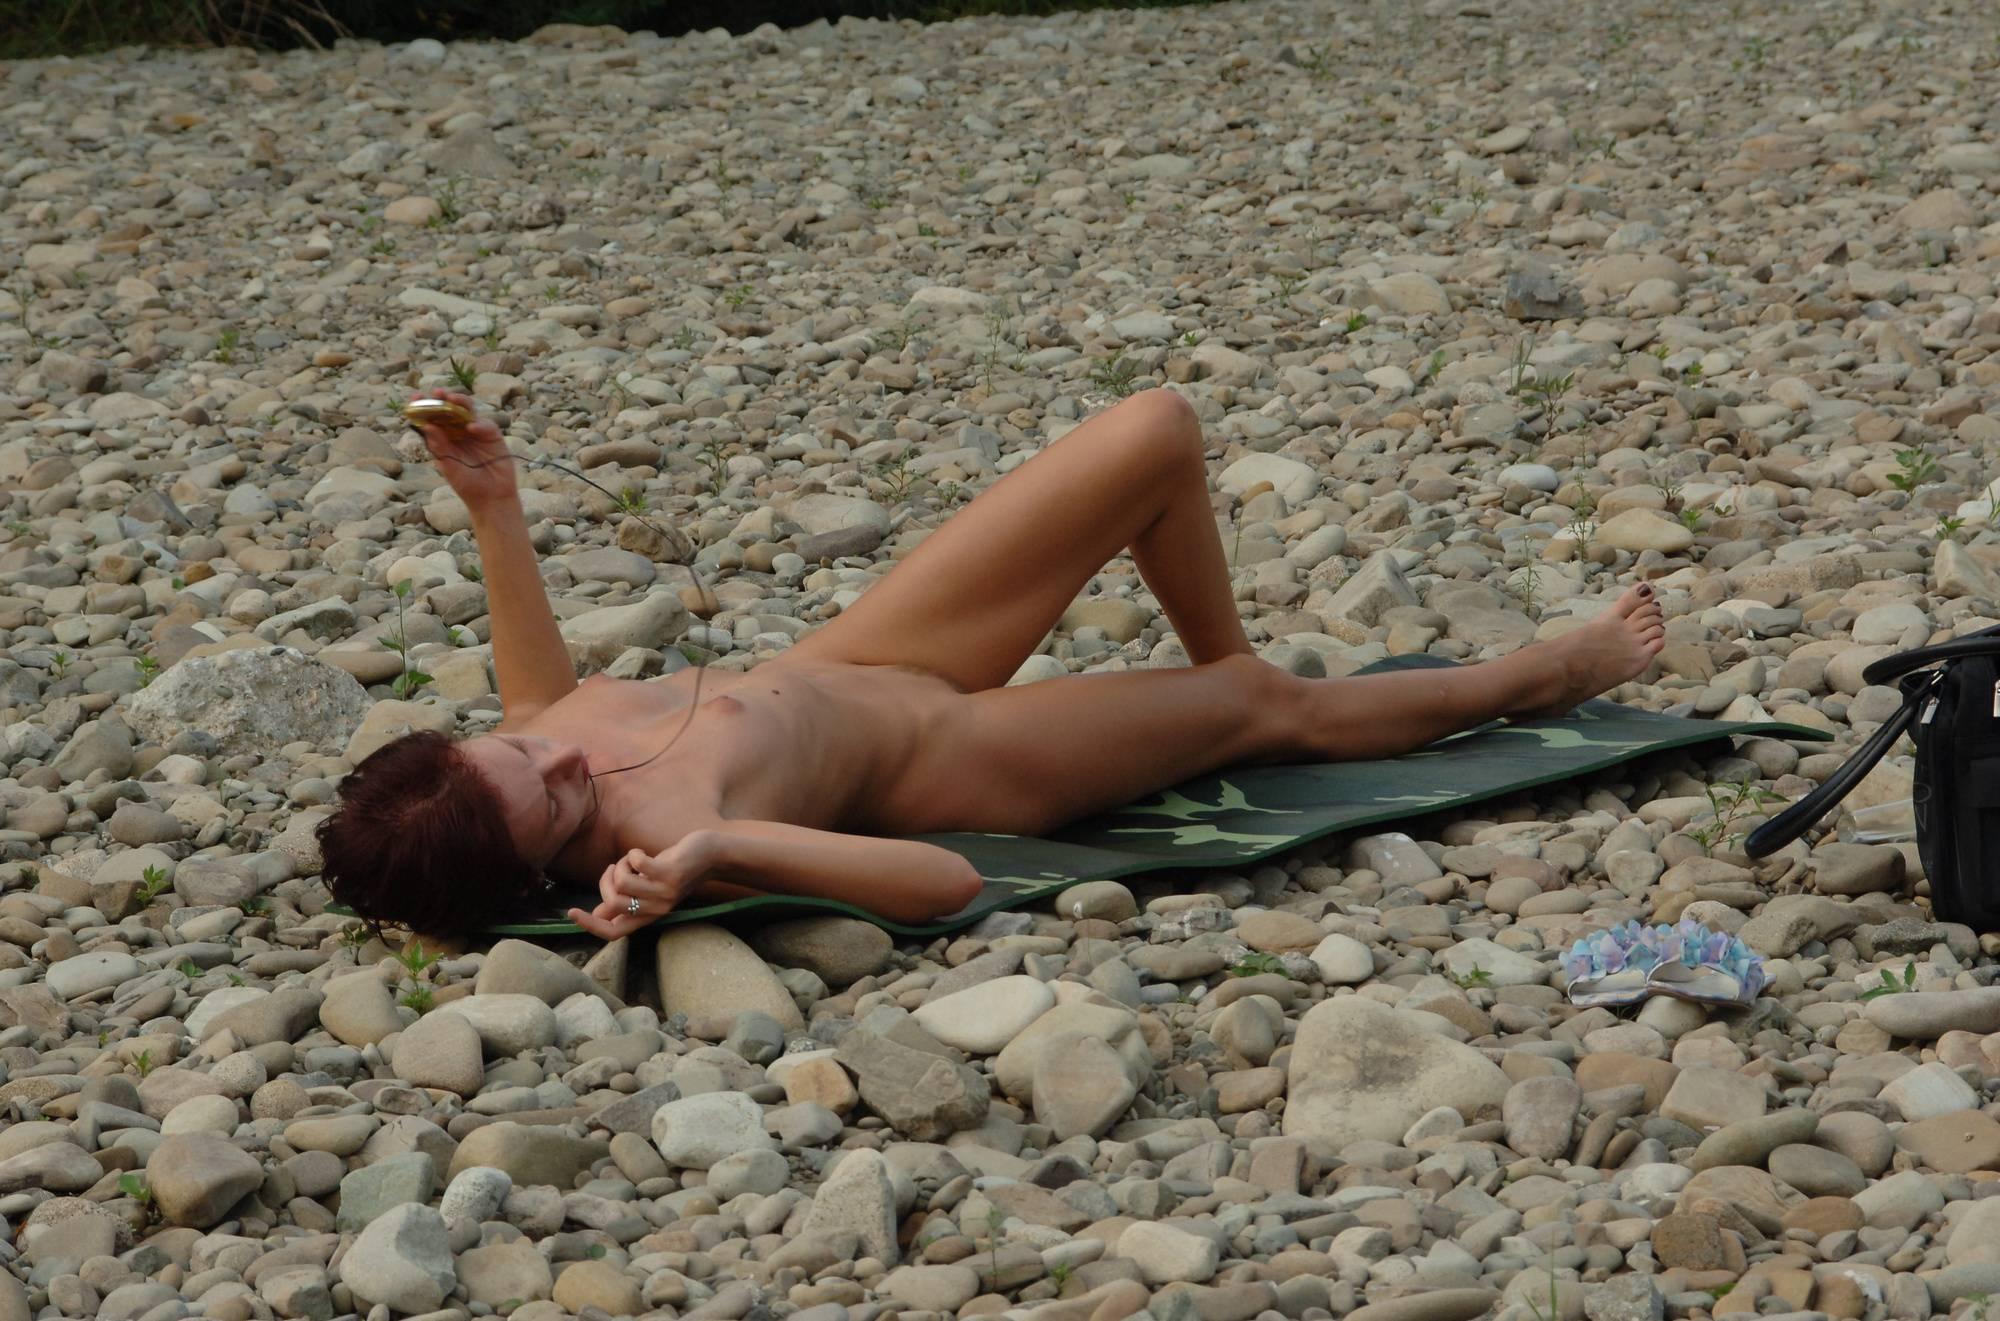 Nudist Pics Dinah's Rocky Beach Walk - 1